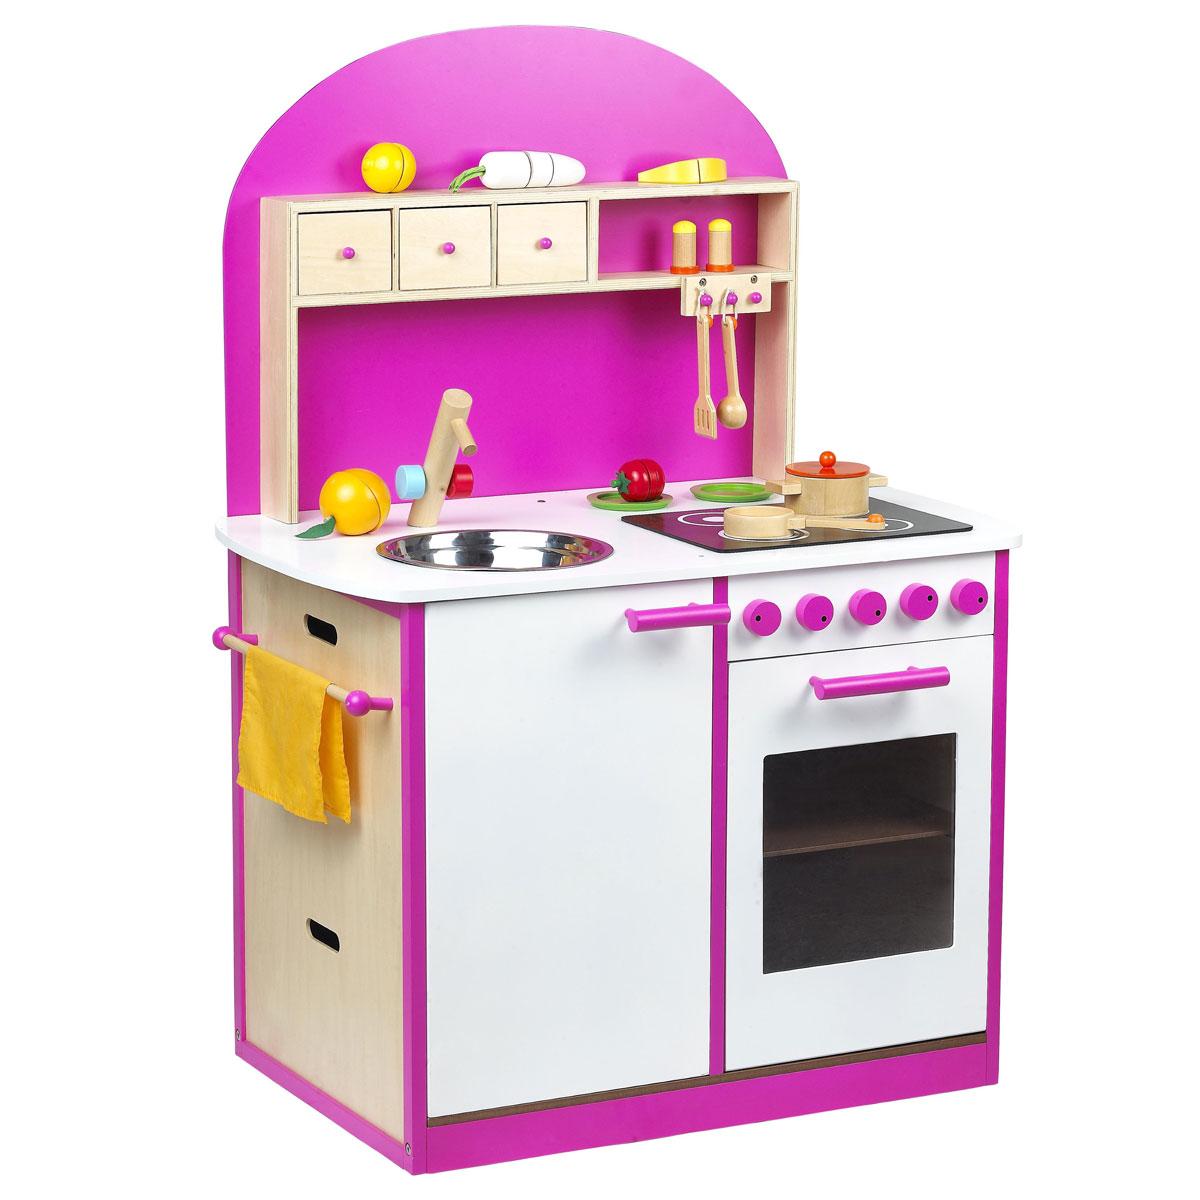 sun kinderk che spielk che aus holz weiss rosa ebay. Black Bedroom Furniture Sets. Home Design Ideas